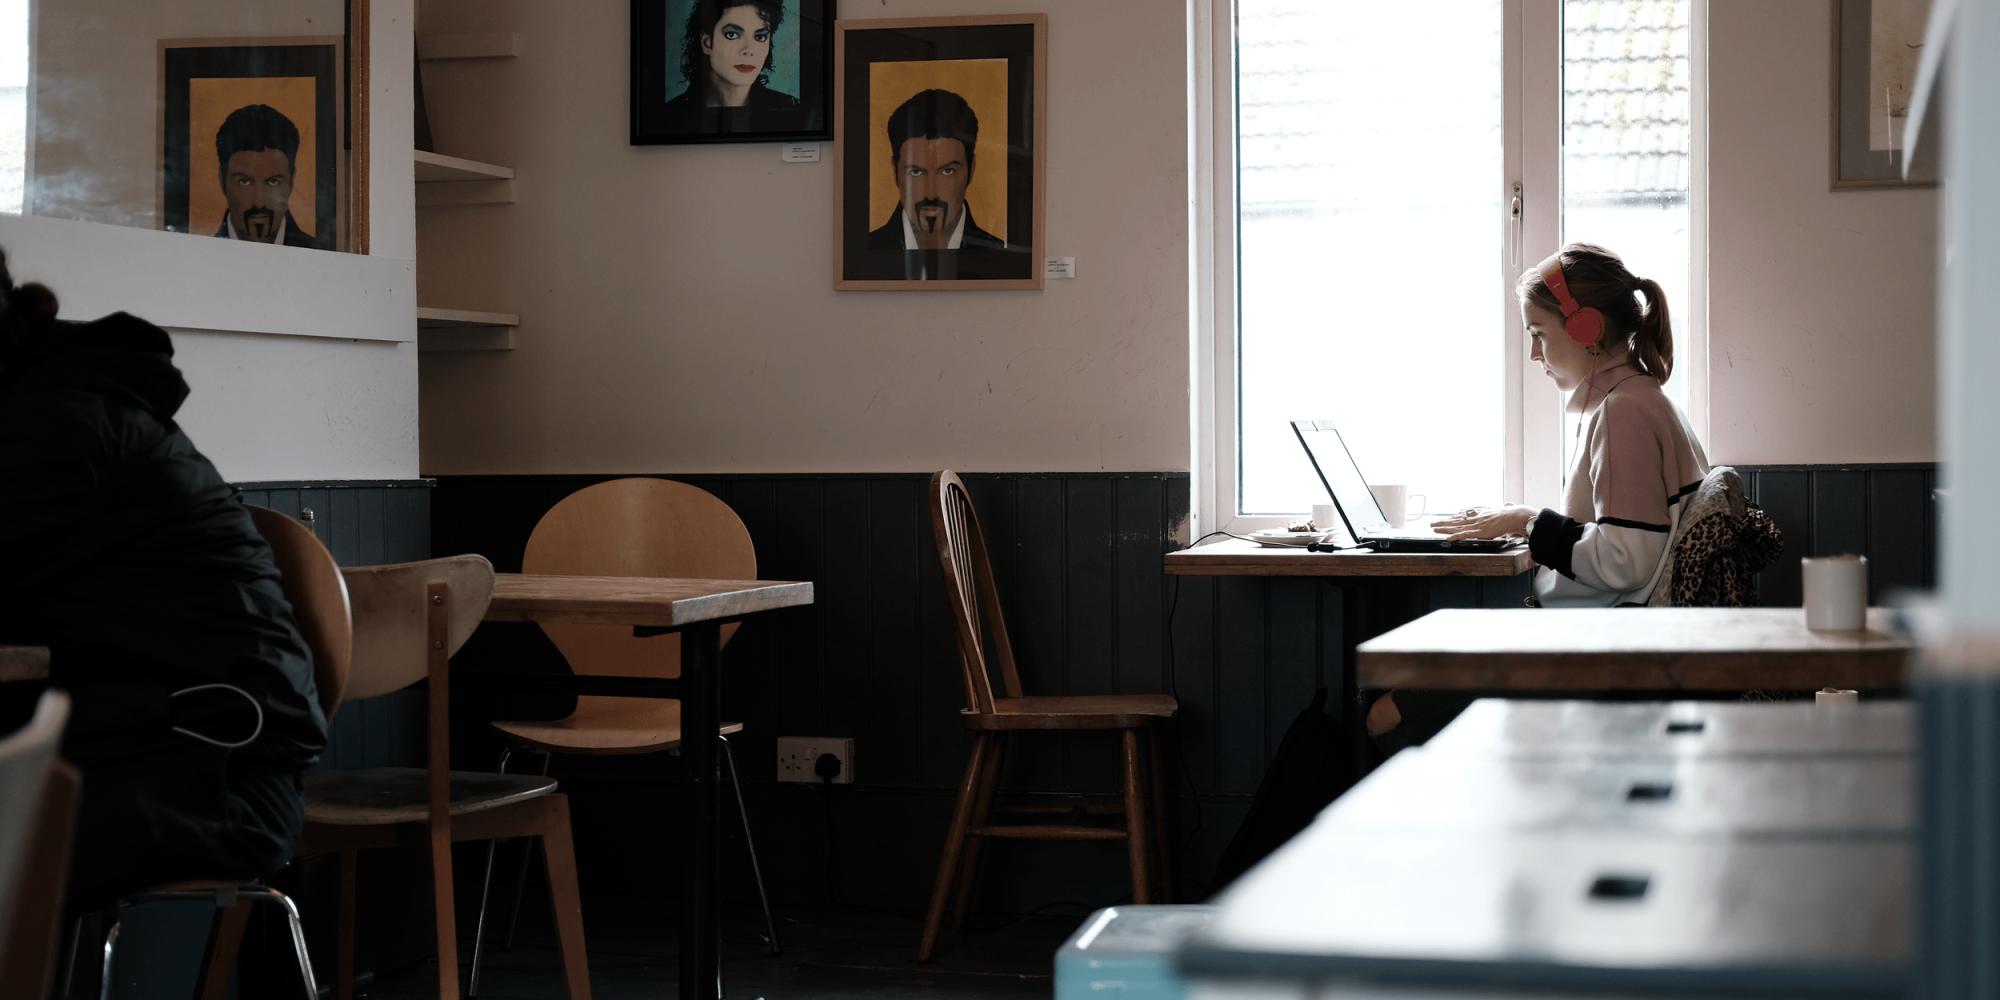 Jolliffes Coffee Shop